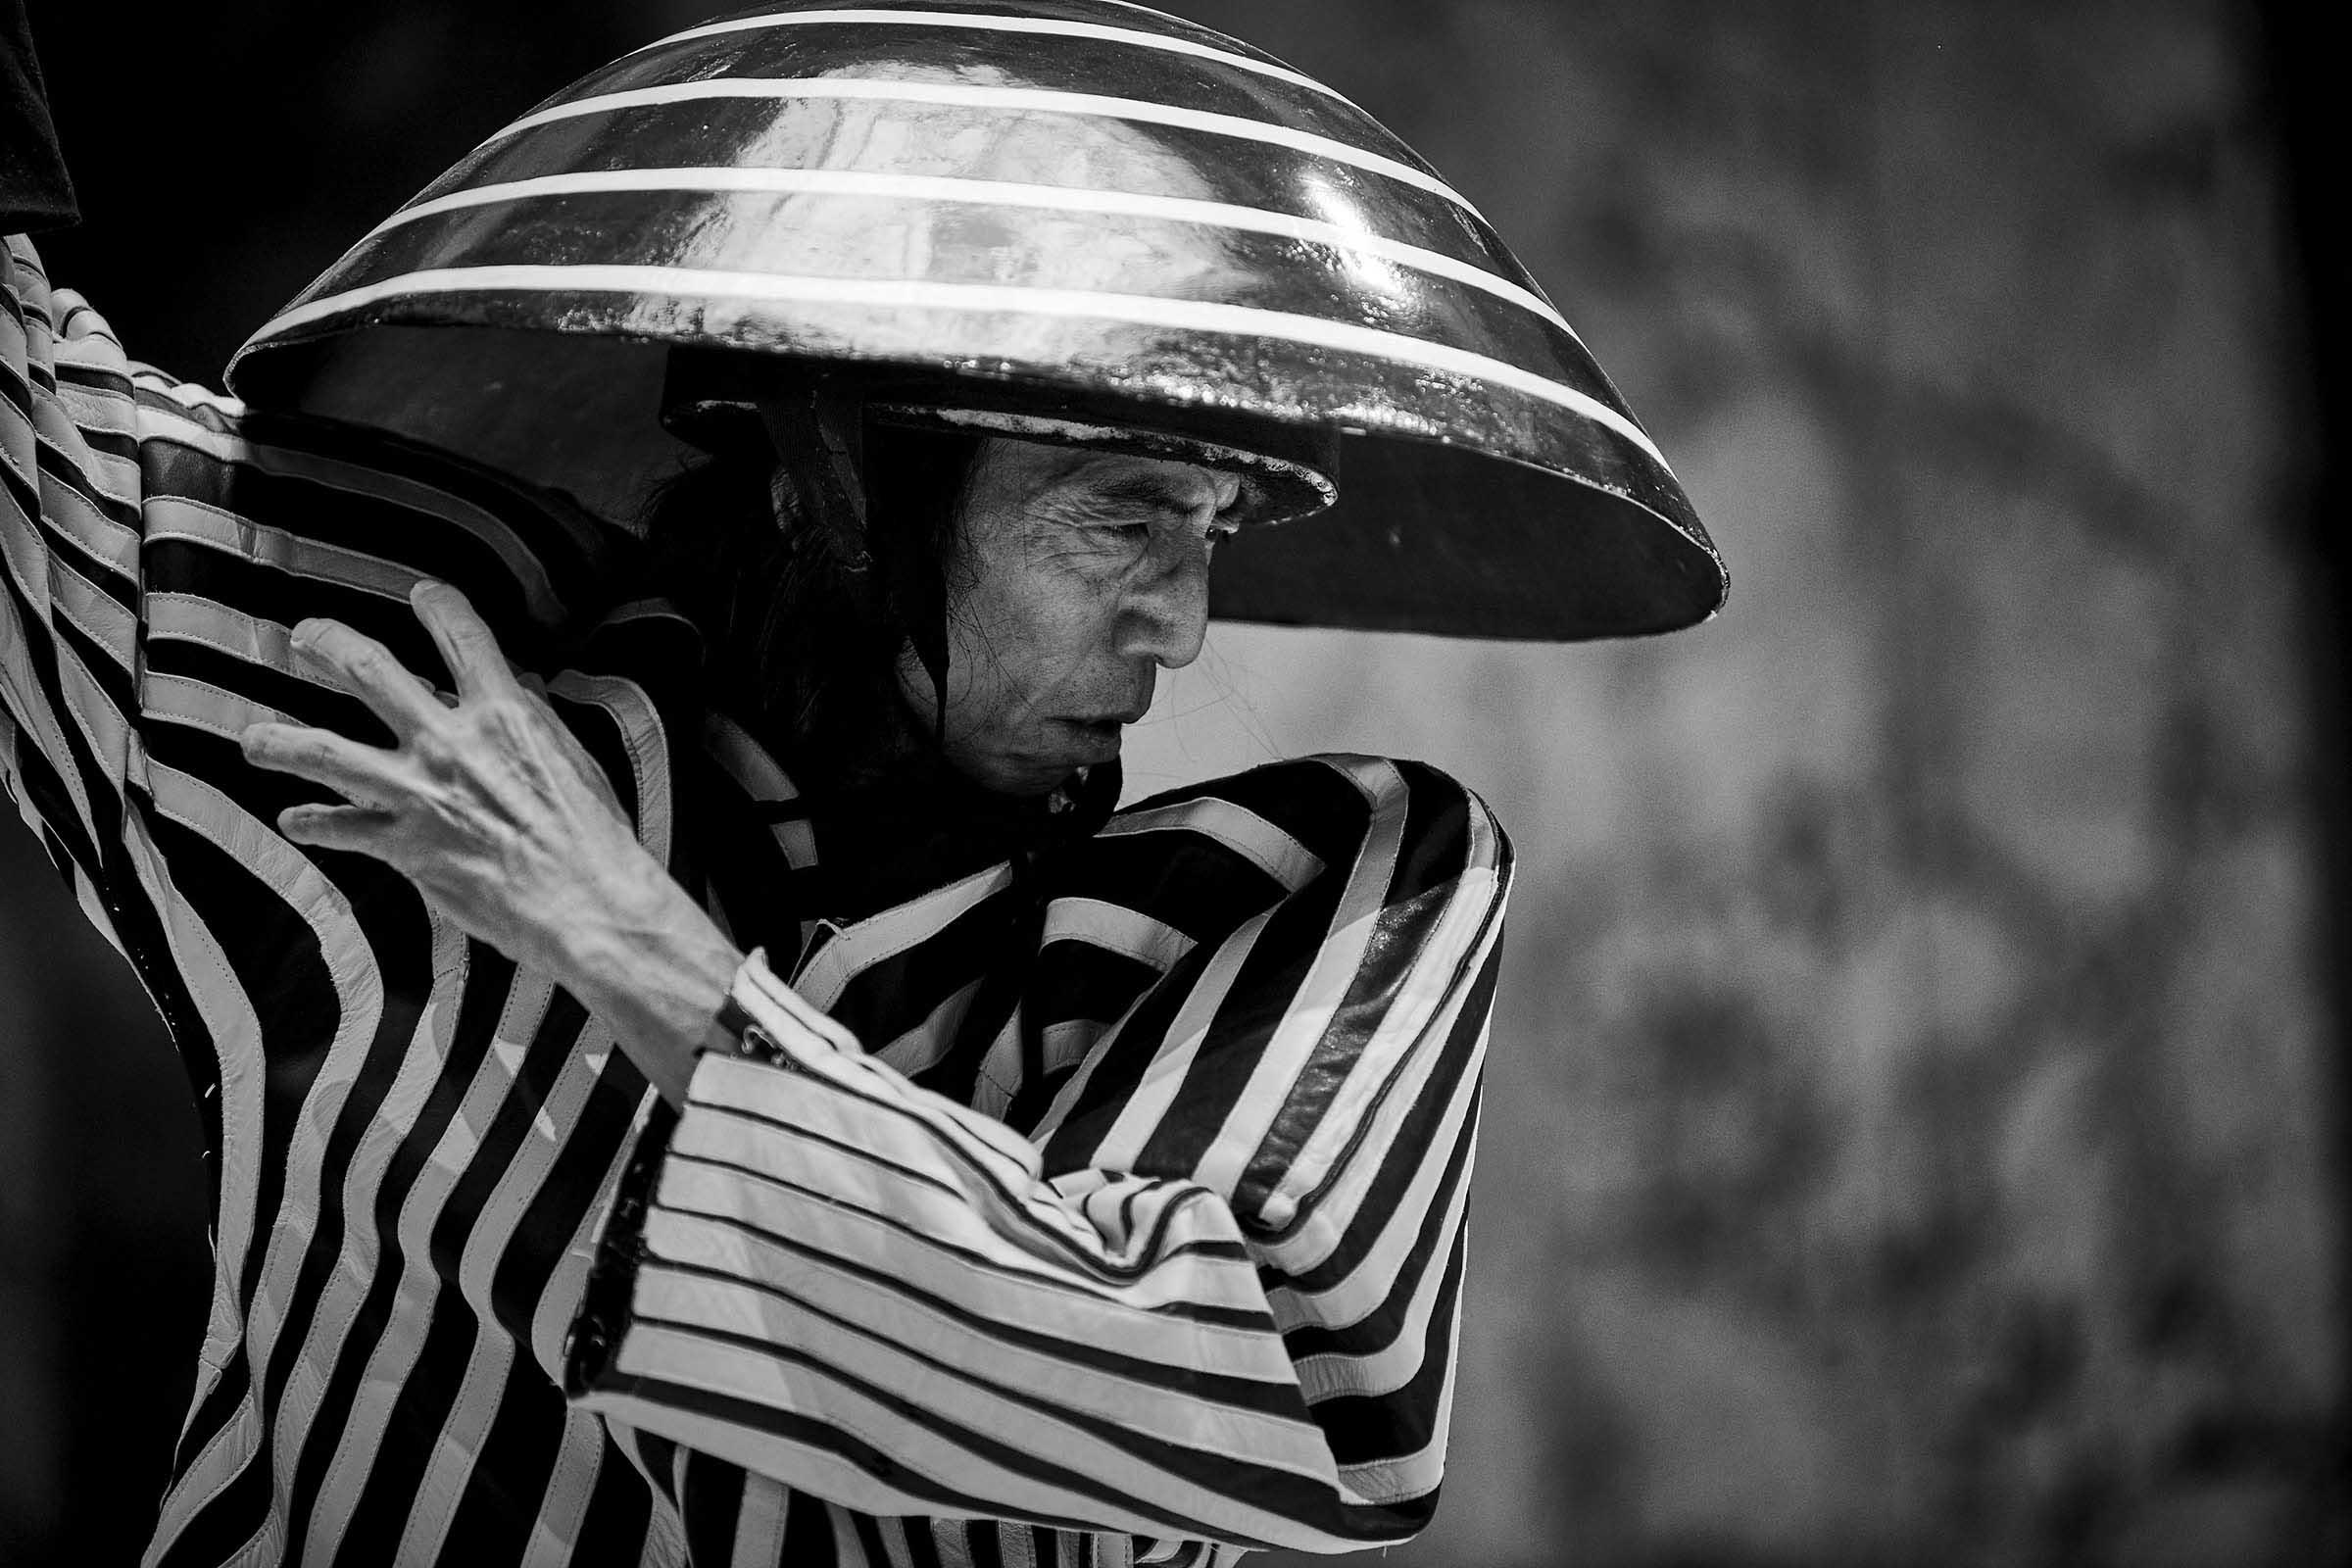 ArtonovYves Dethier © DYOD